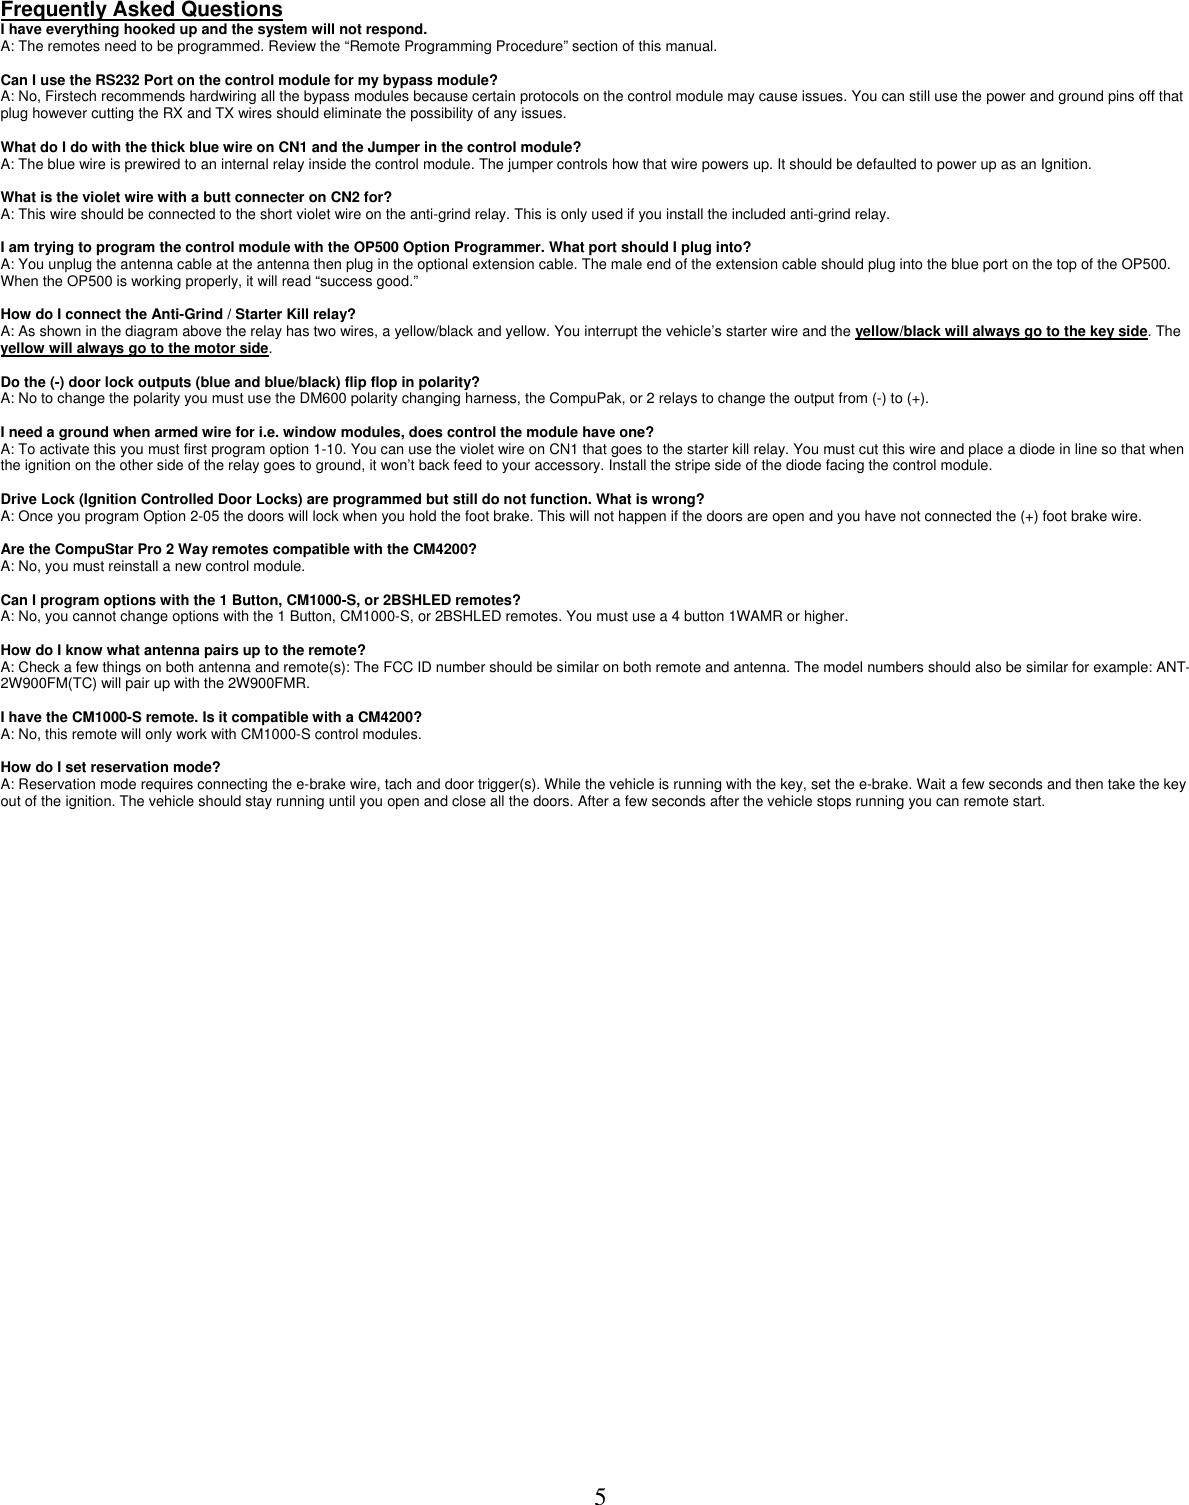 Compustar Cm4200 Users Manual on